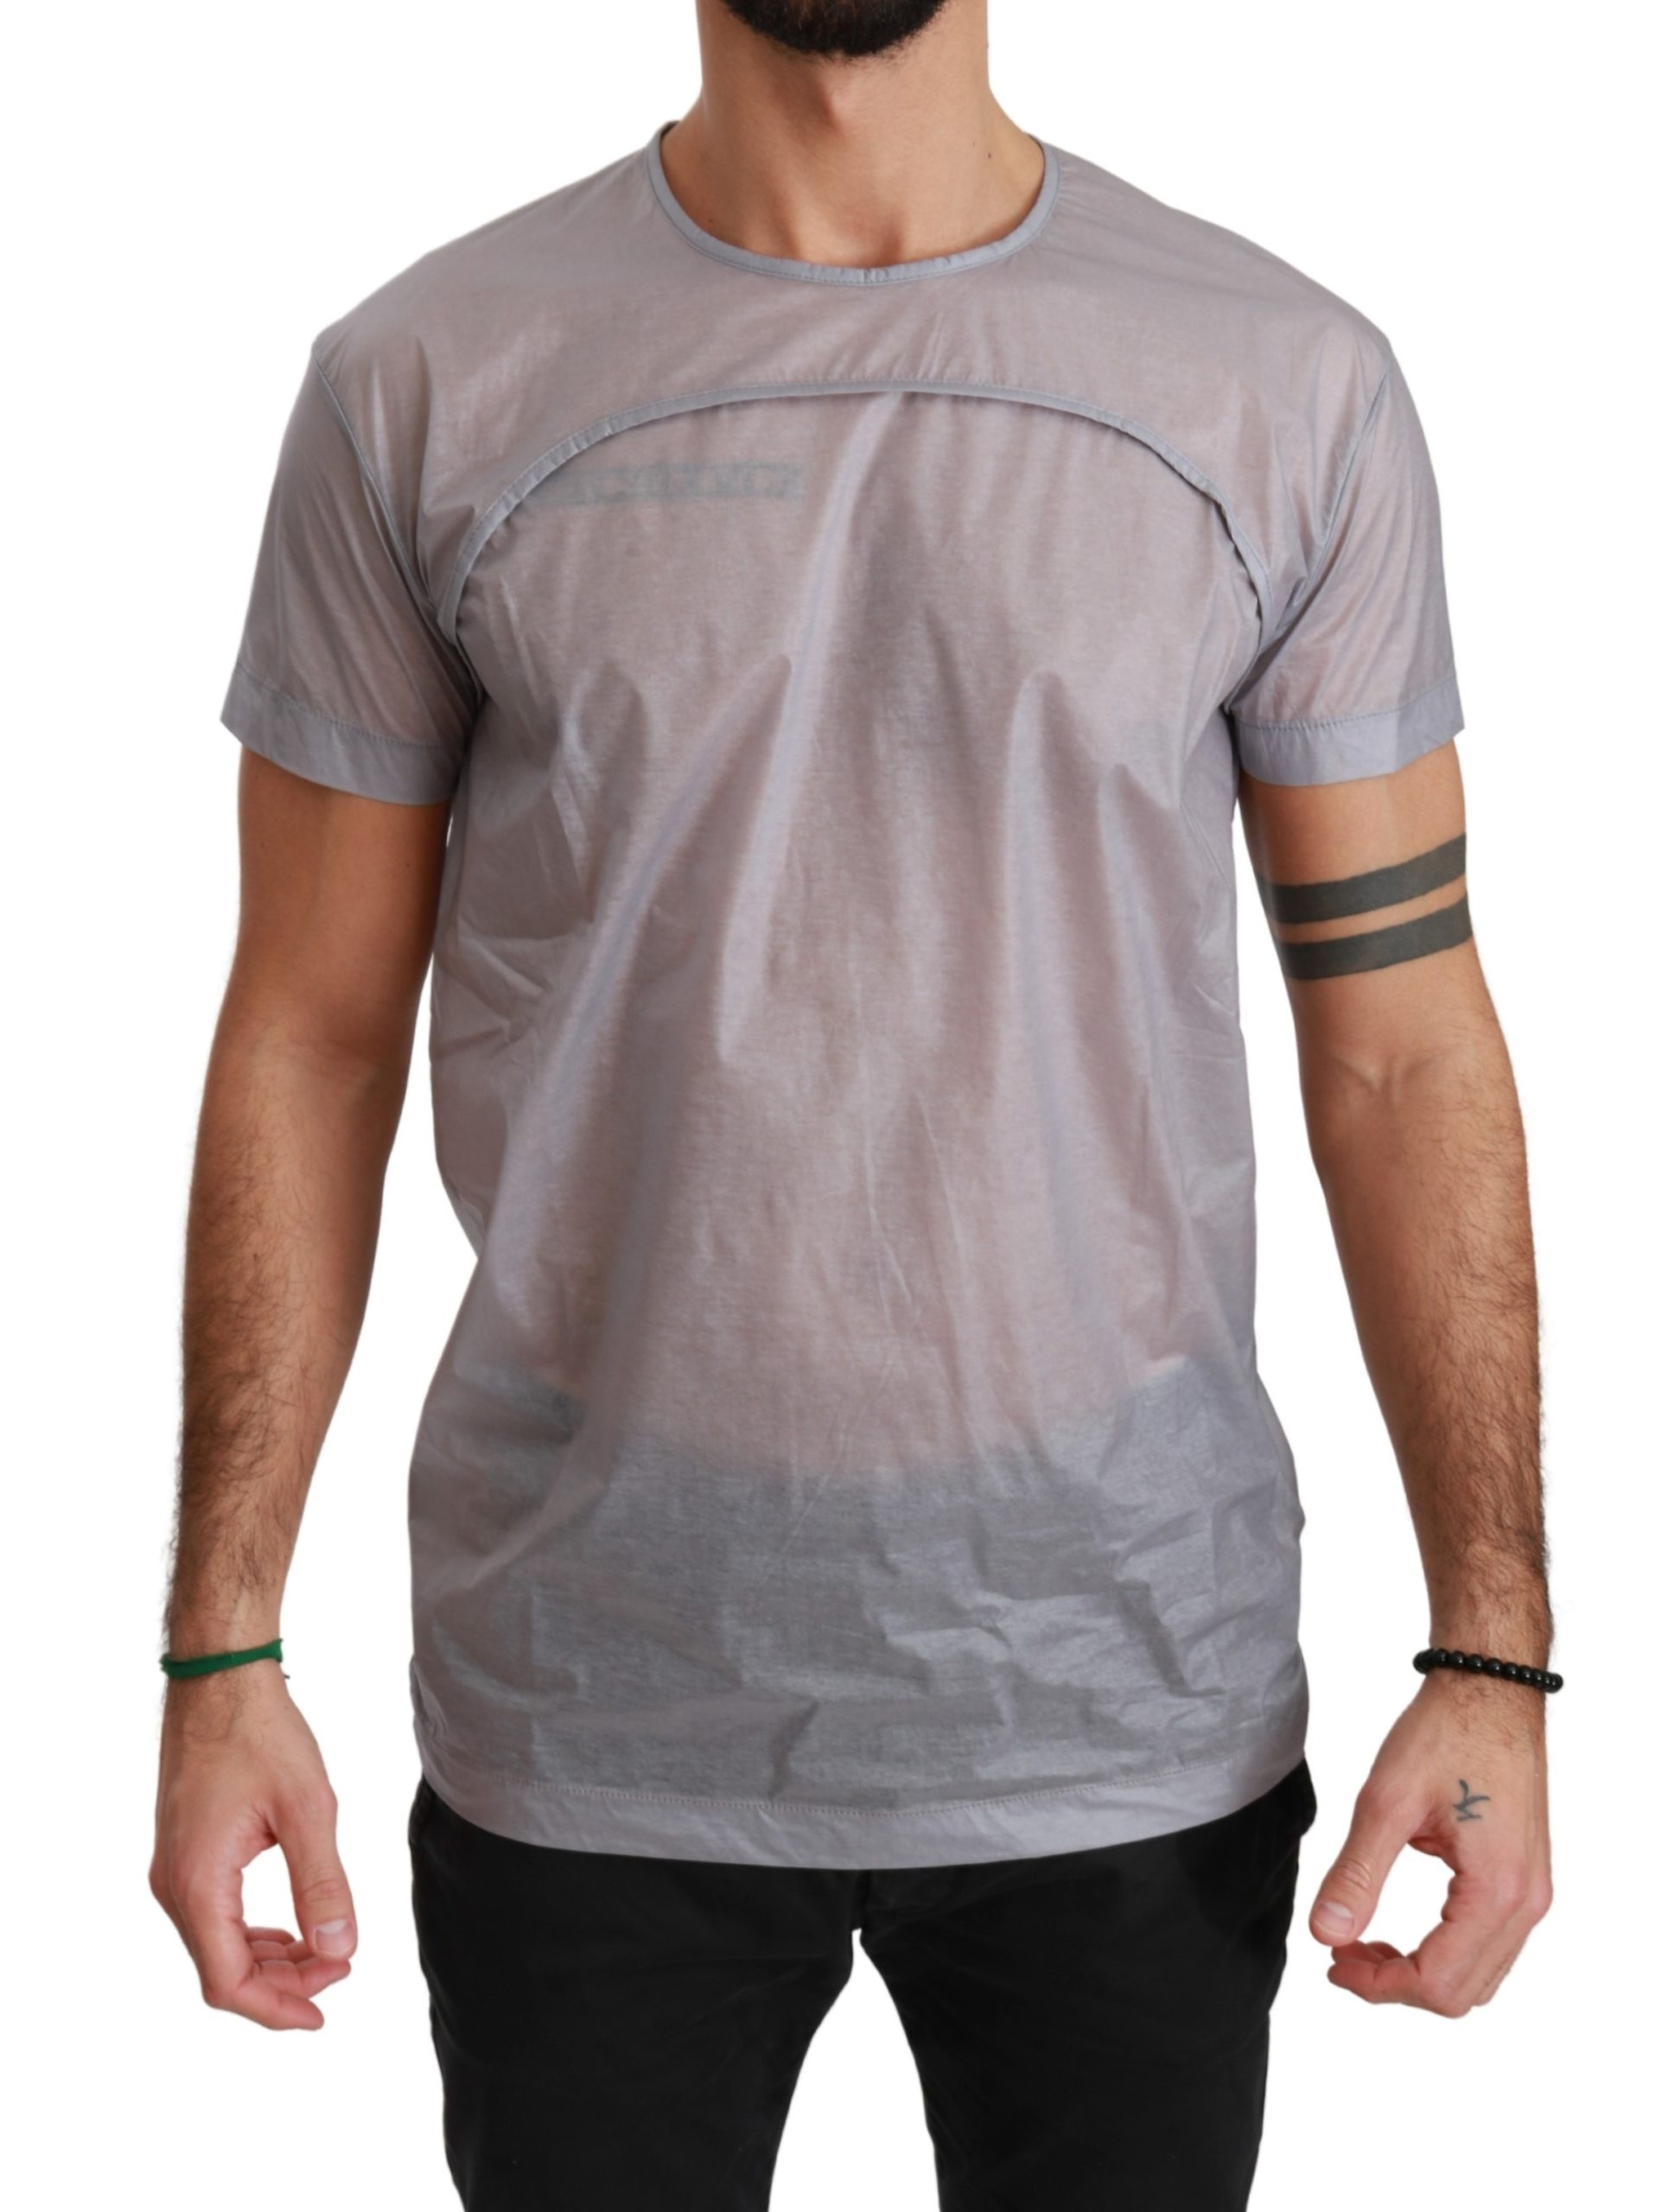 Dolce & Gabbana Men's See Through Roundneck T-Shirts Gray TSH4051 - L